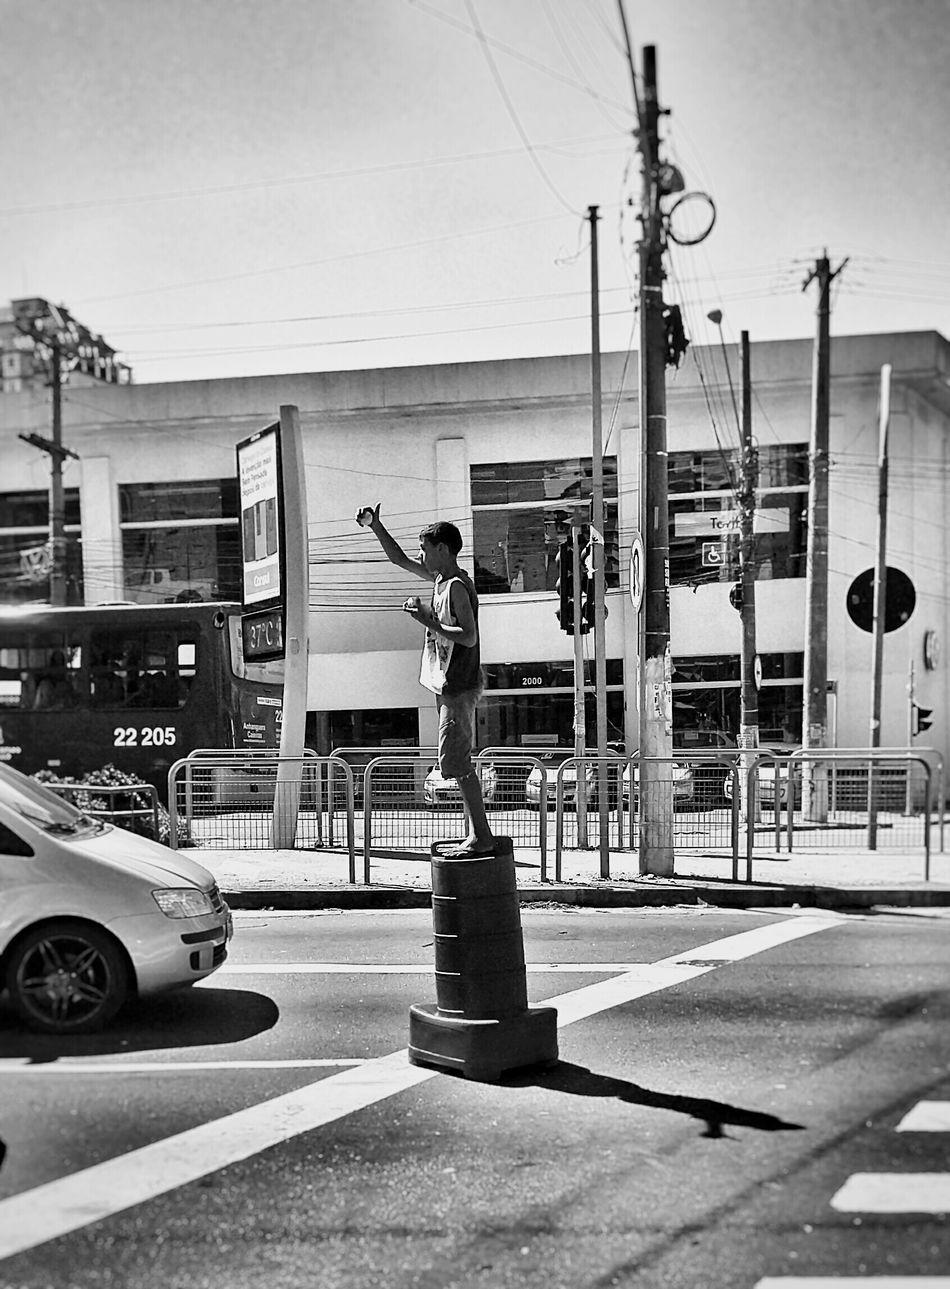 Untold Stories Street Photography Blackandwhite Streetphoto_bw Monoart NEM Black&white Mobliephotography